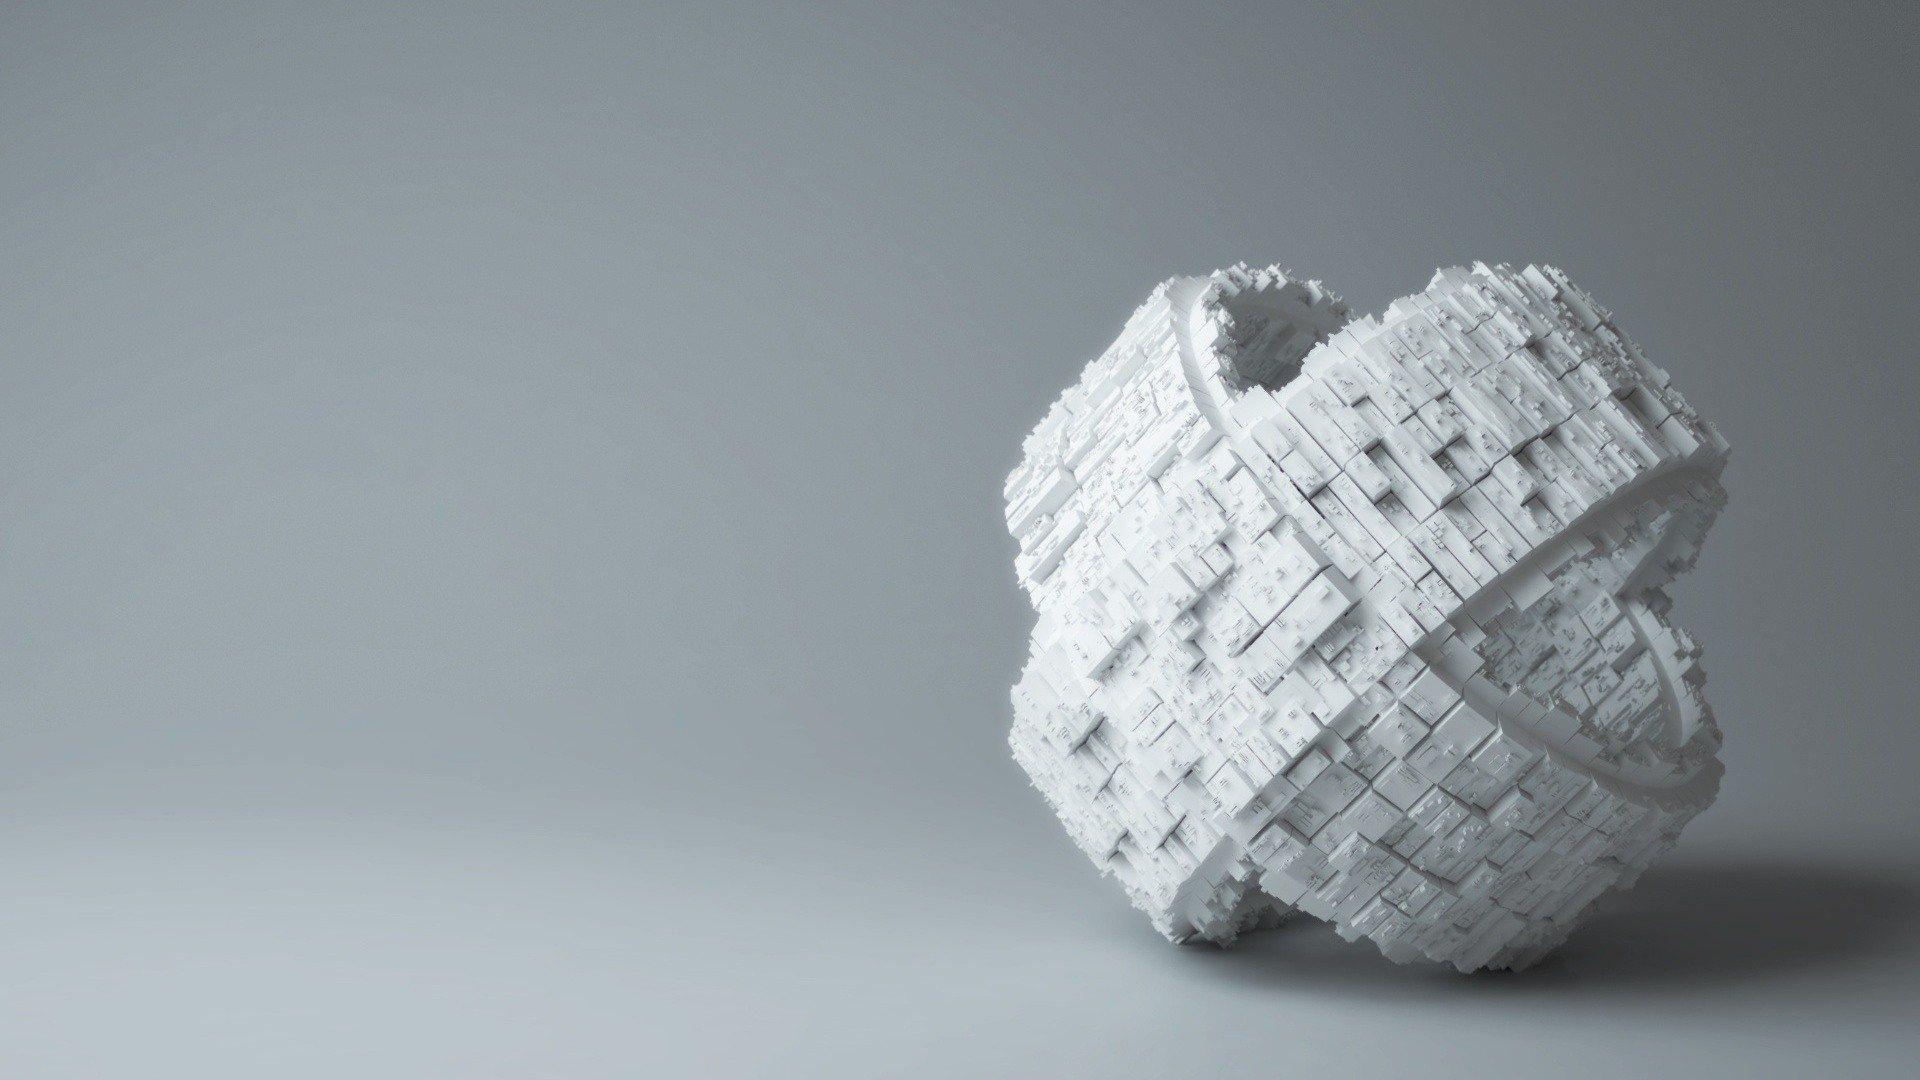 White Puzzle Piece 3D Background Wallpaper 1920x1080